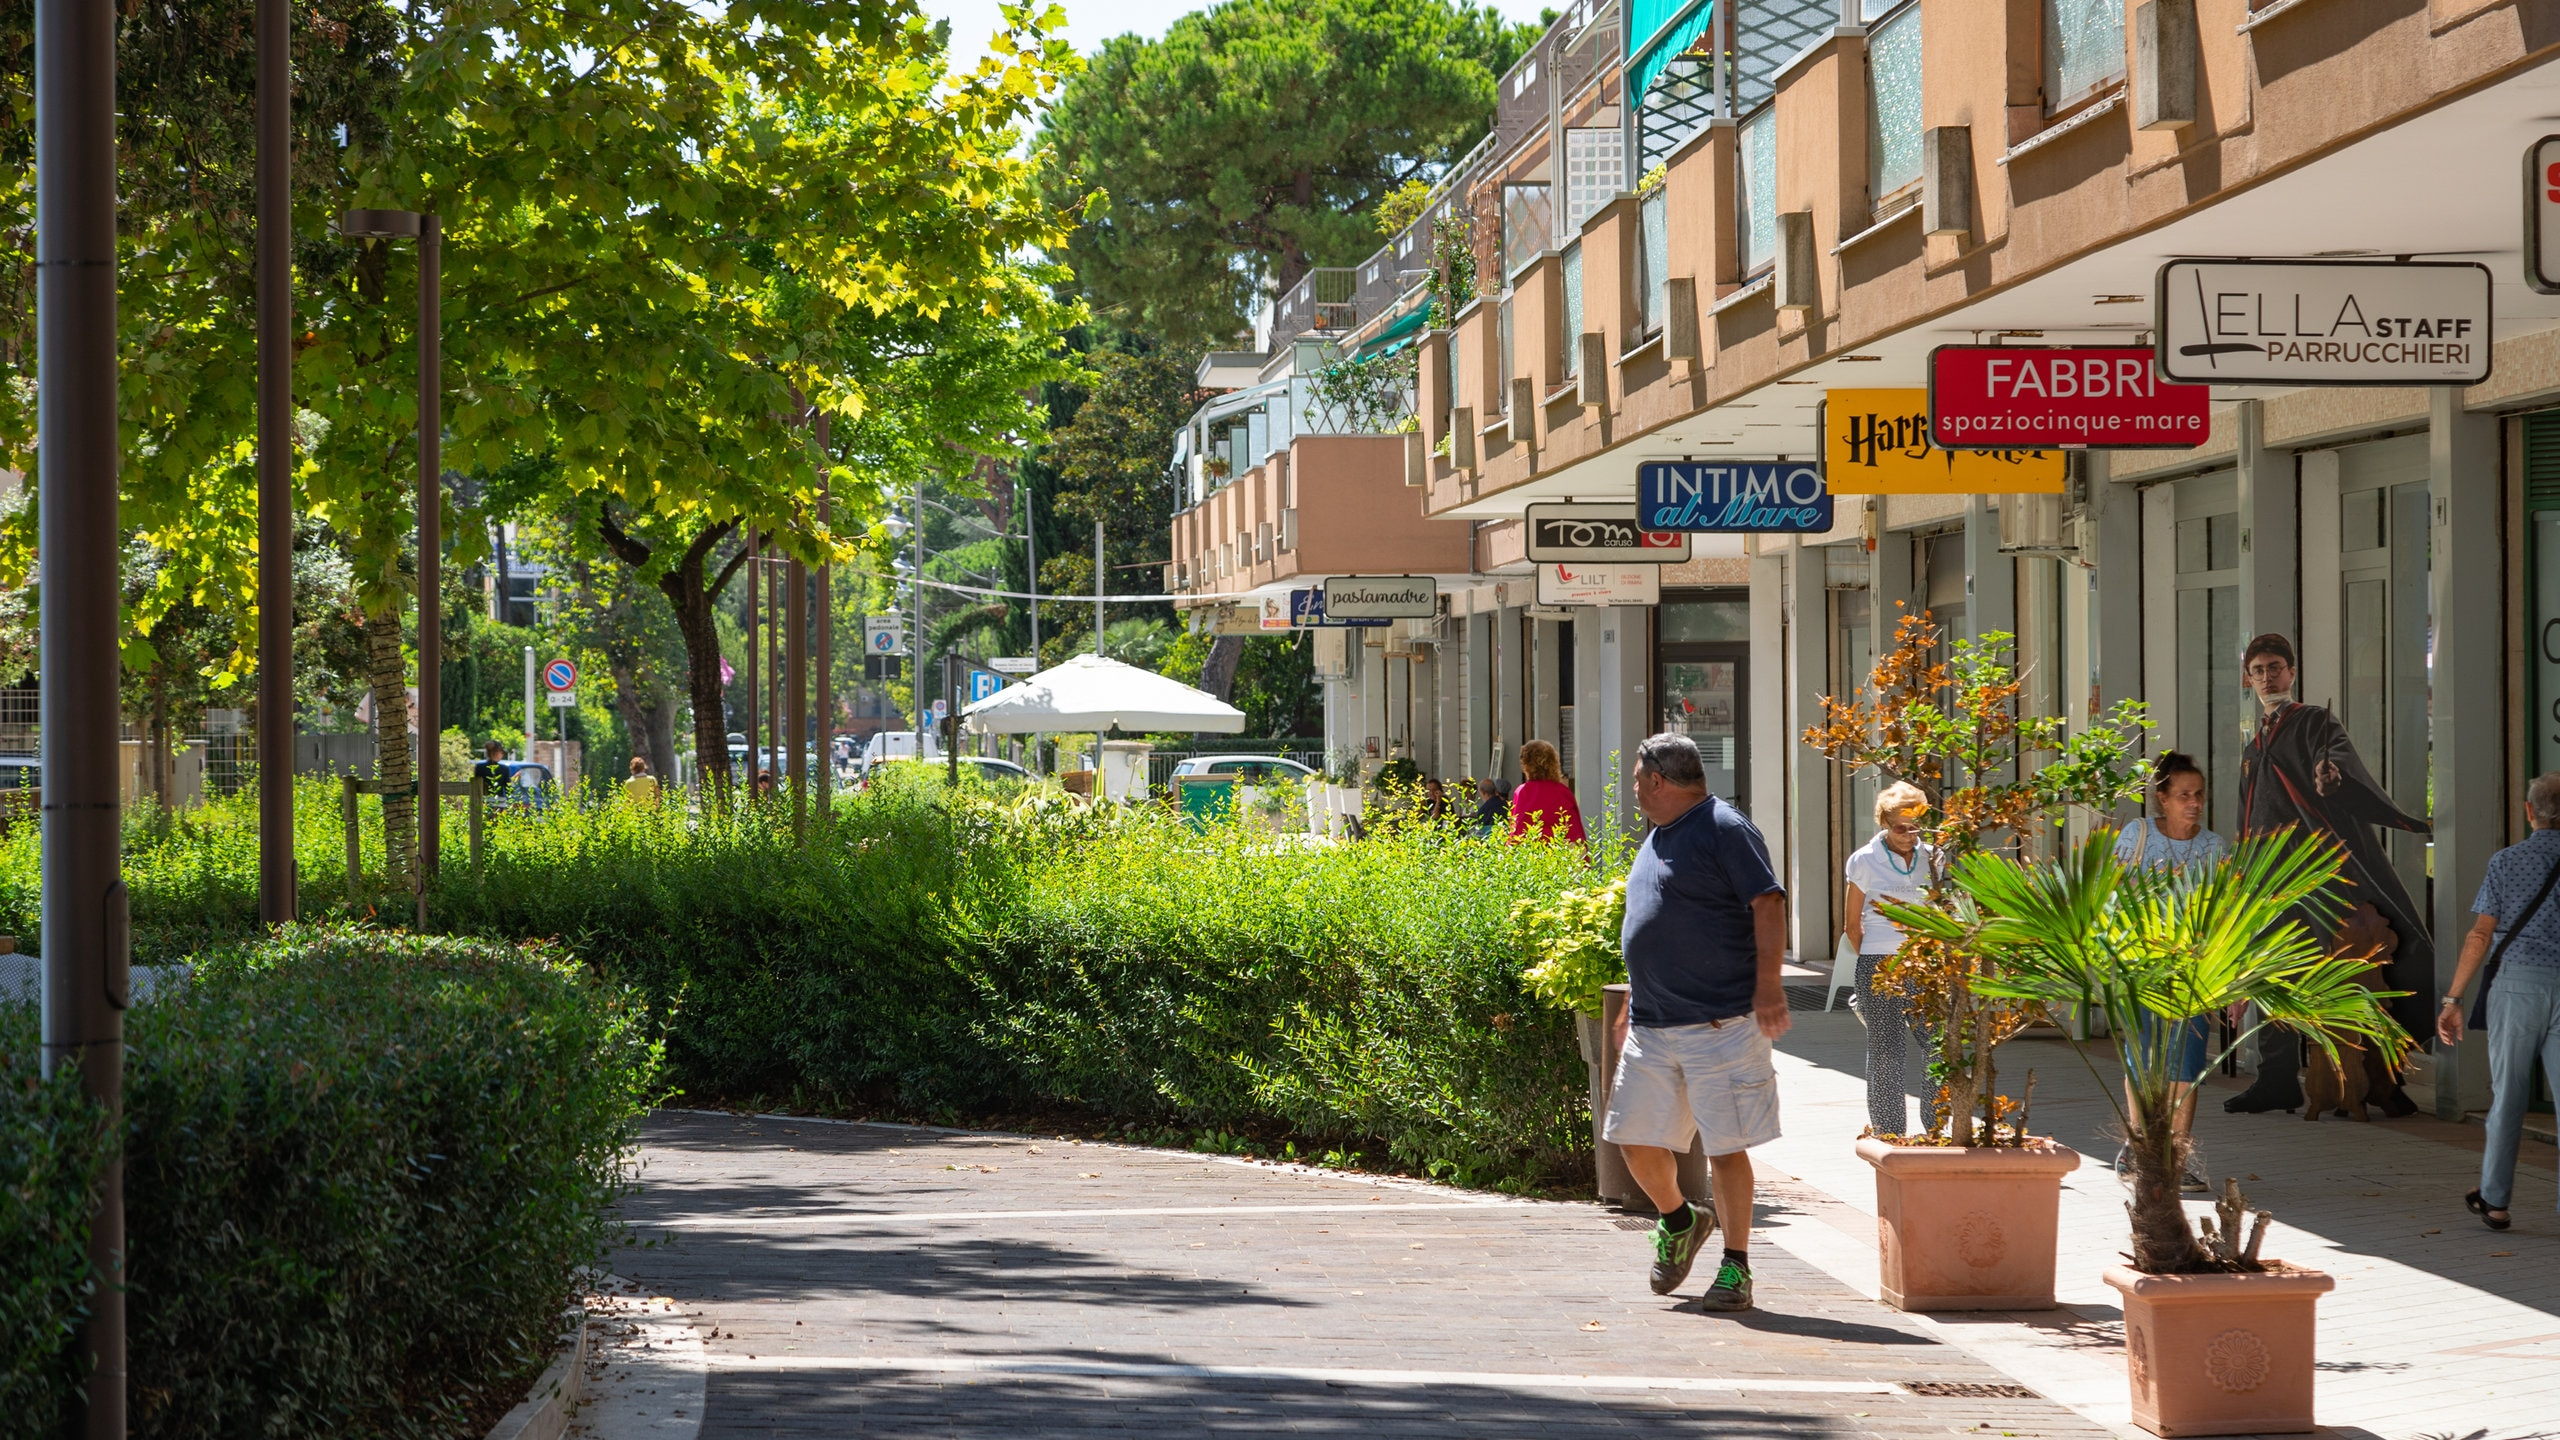 Marina Centro, Rimini, Emilia-Romagna, Italy